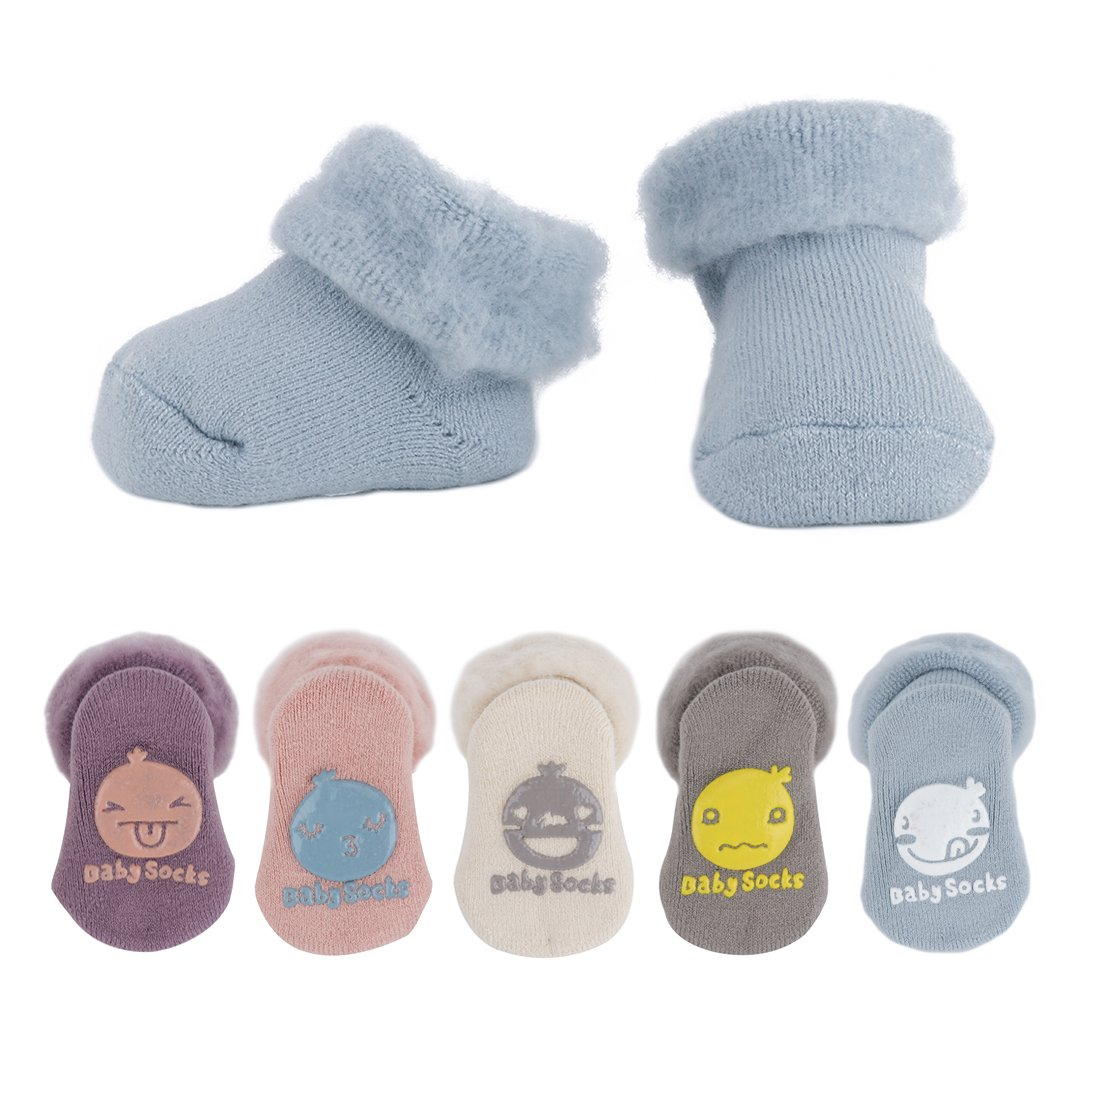 Ehdching 5 Pack Newborn Unisex Baby Toddler Boy Girl Organic Thick Cotton Turn Cuff Slipper Socks (XS(0-6 Months))